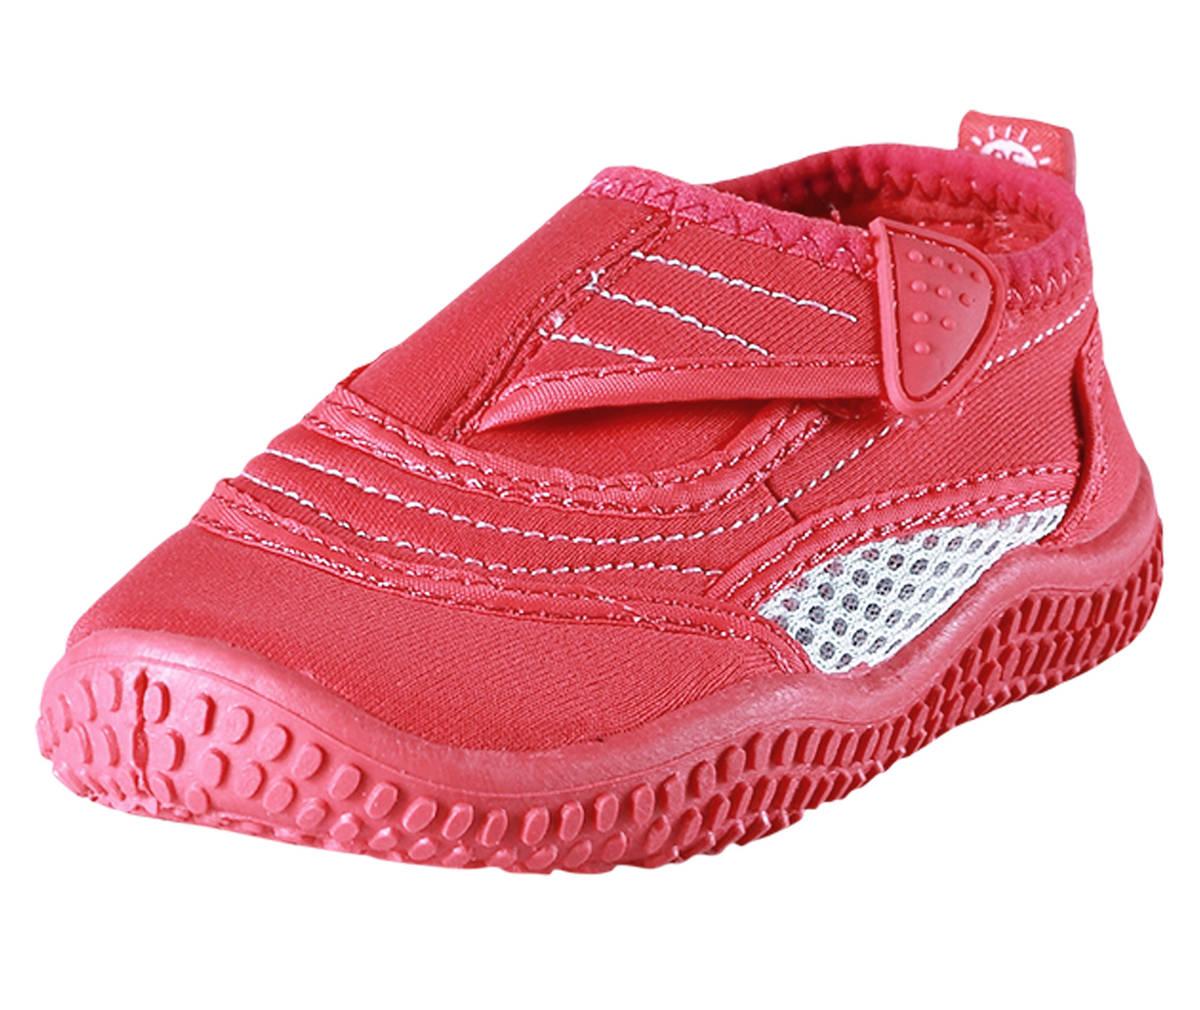 Reima Aqua uimatossut - Strawberry Red/Rose - Uimatossut - 30021544747 - 1